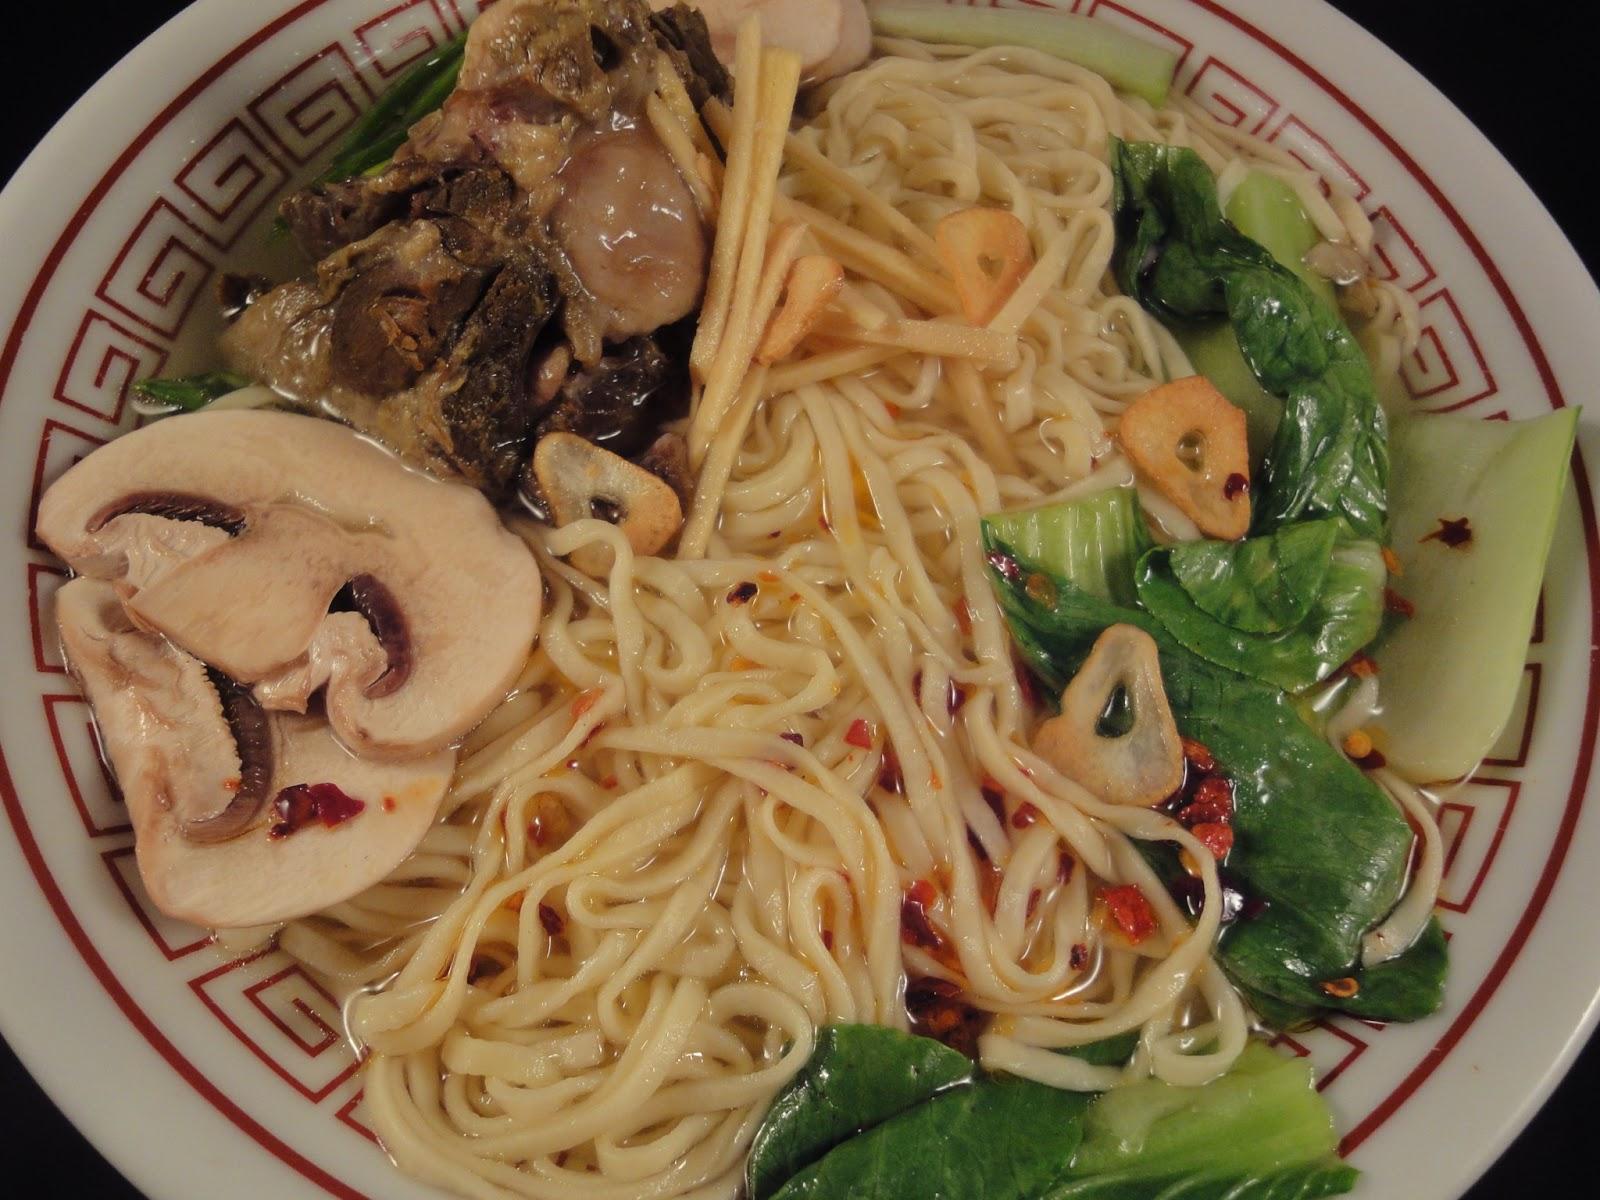 oxtail, oxtail ramen, oxtail noodles, oxtail noodle soup, Japanese ...